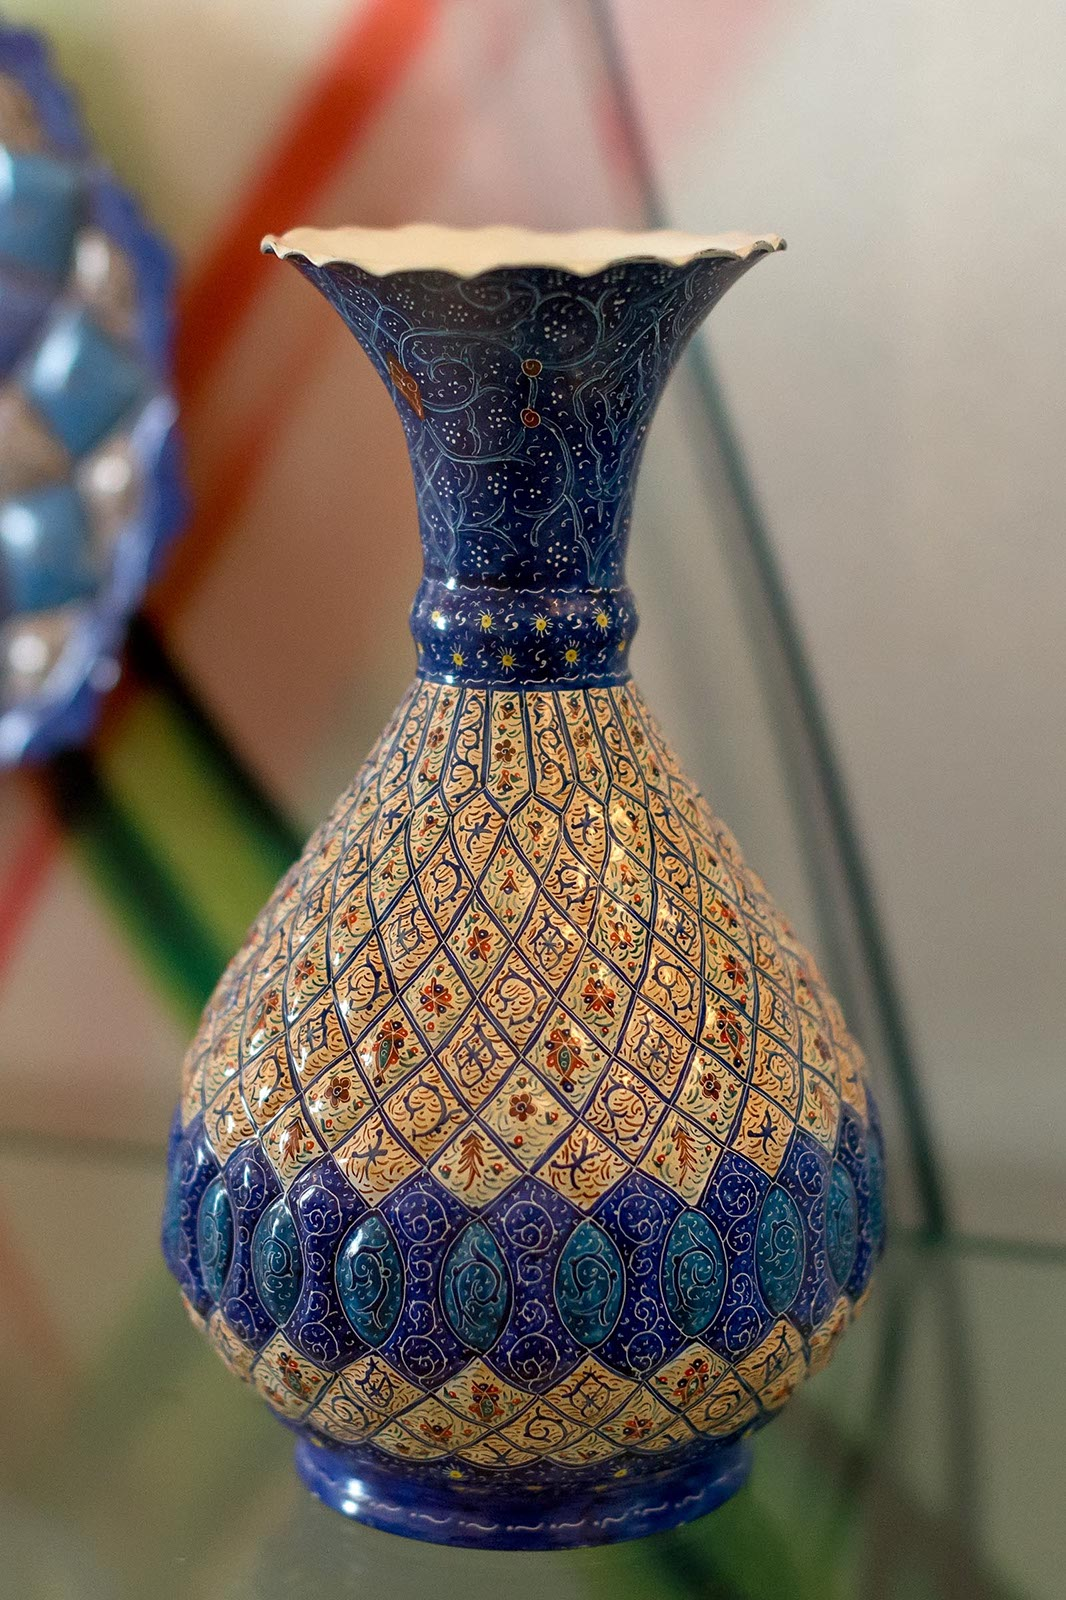 Фото №176404. Декоративная ваза с орнаментом